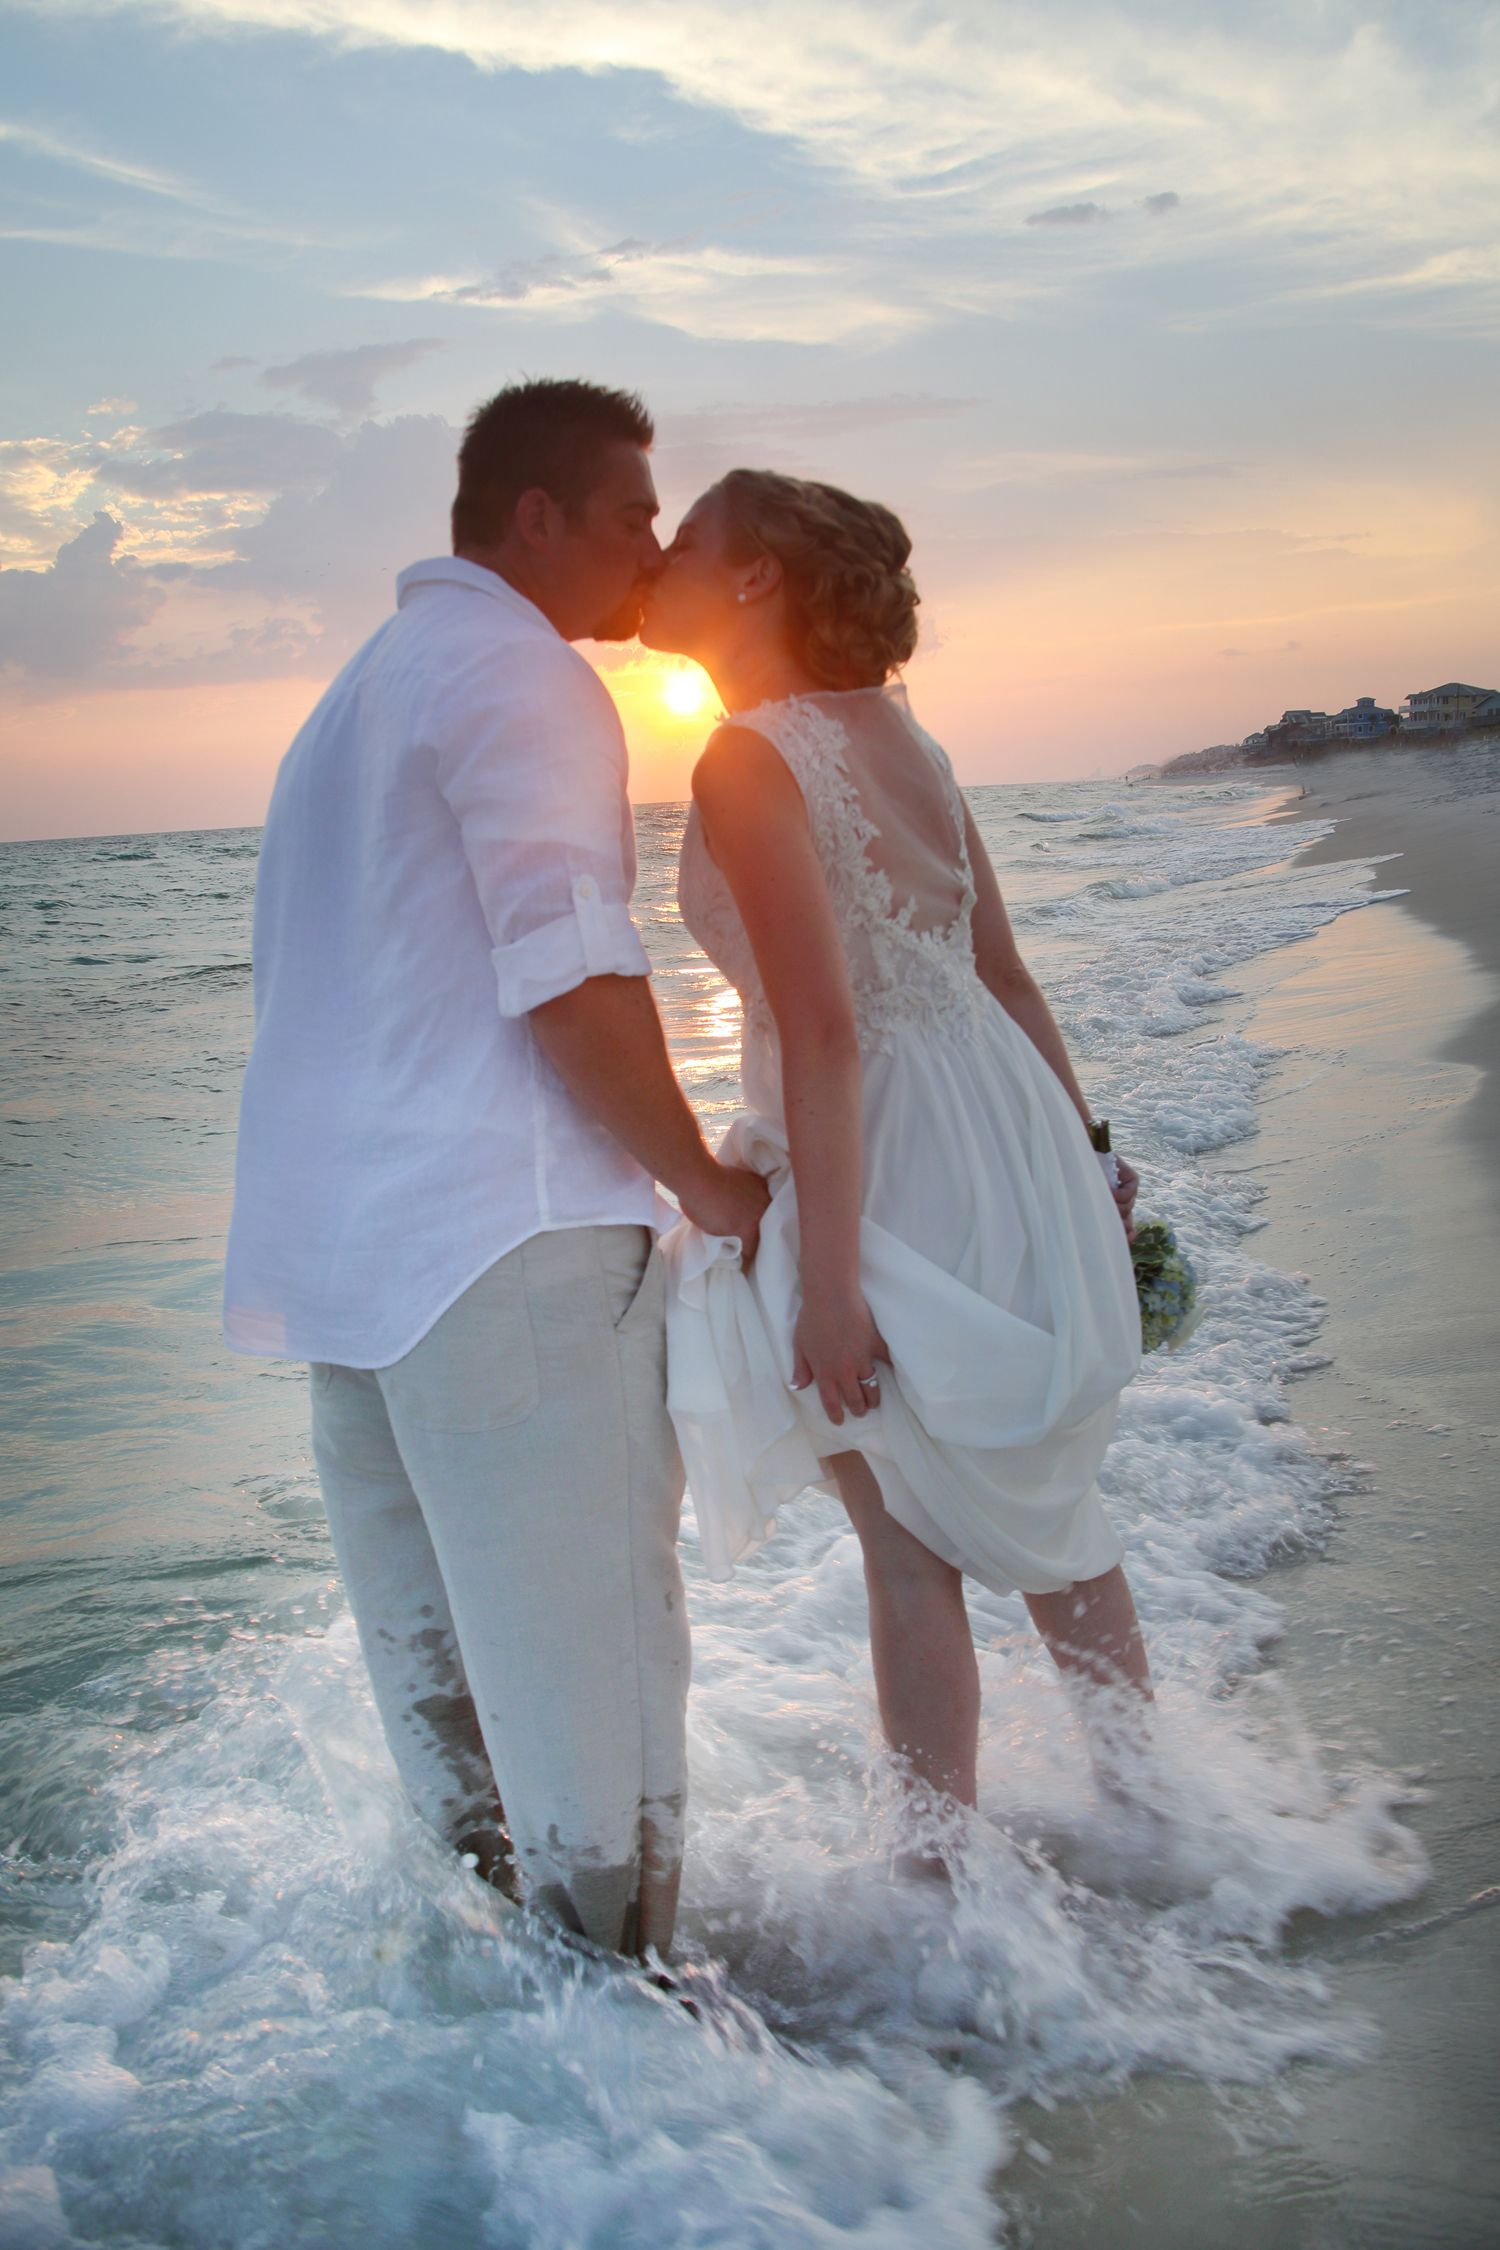 #angelafrancesphotography #beachwedding #floridawedding #destinwedding #gulfcoastwedding #NWFLBride #EmeraldCoastWedding #WaterfrontWeddings #angelafrancesphoto #gulfcoastwedding #30-A #30-AWedding #desitnsunset #destinsunsetwedding #annasveranda #rosemarybeach #rosemarybeachwedding